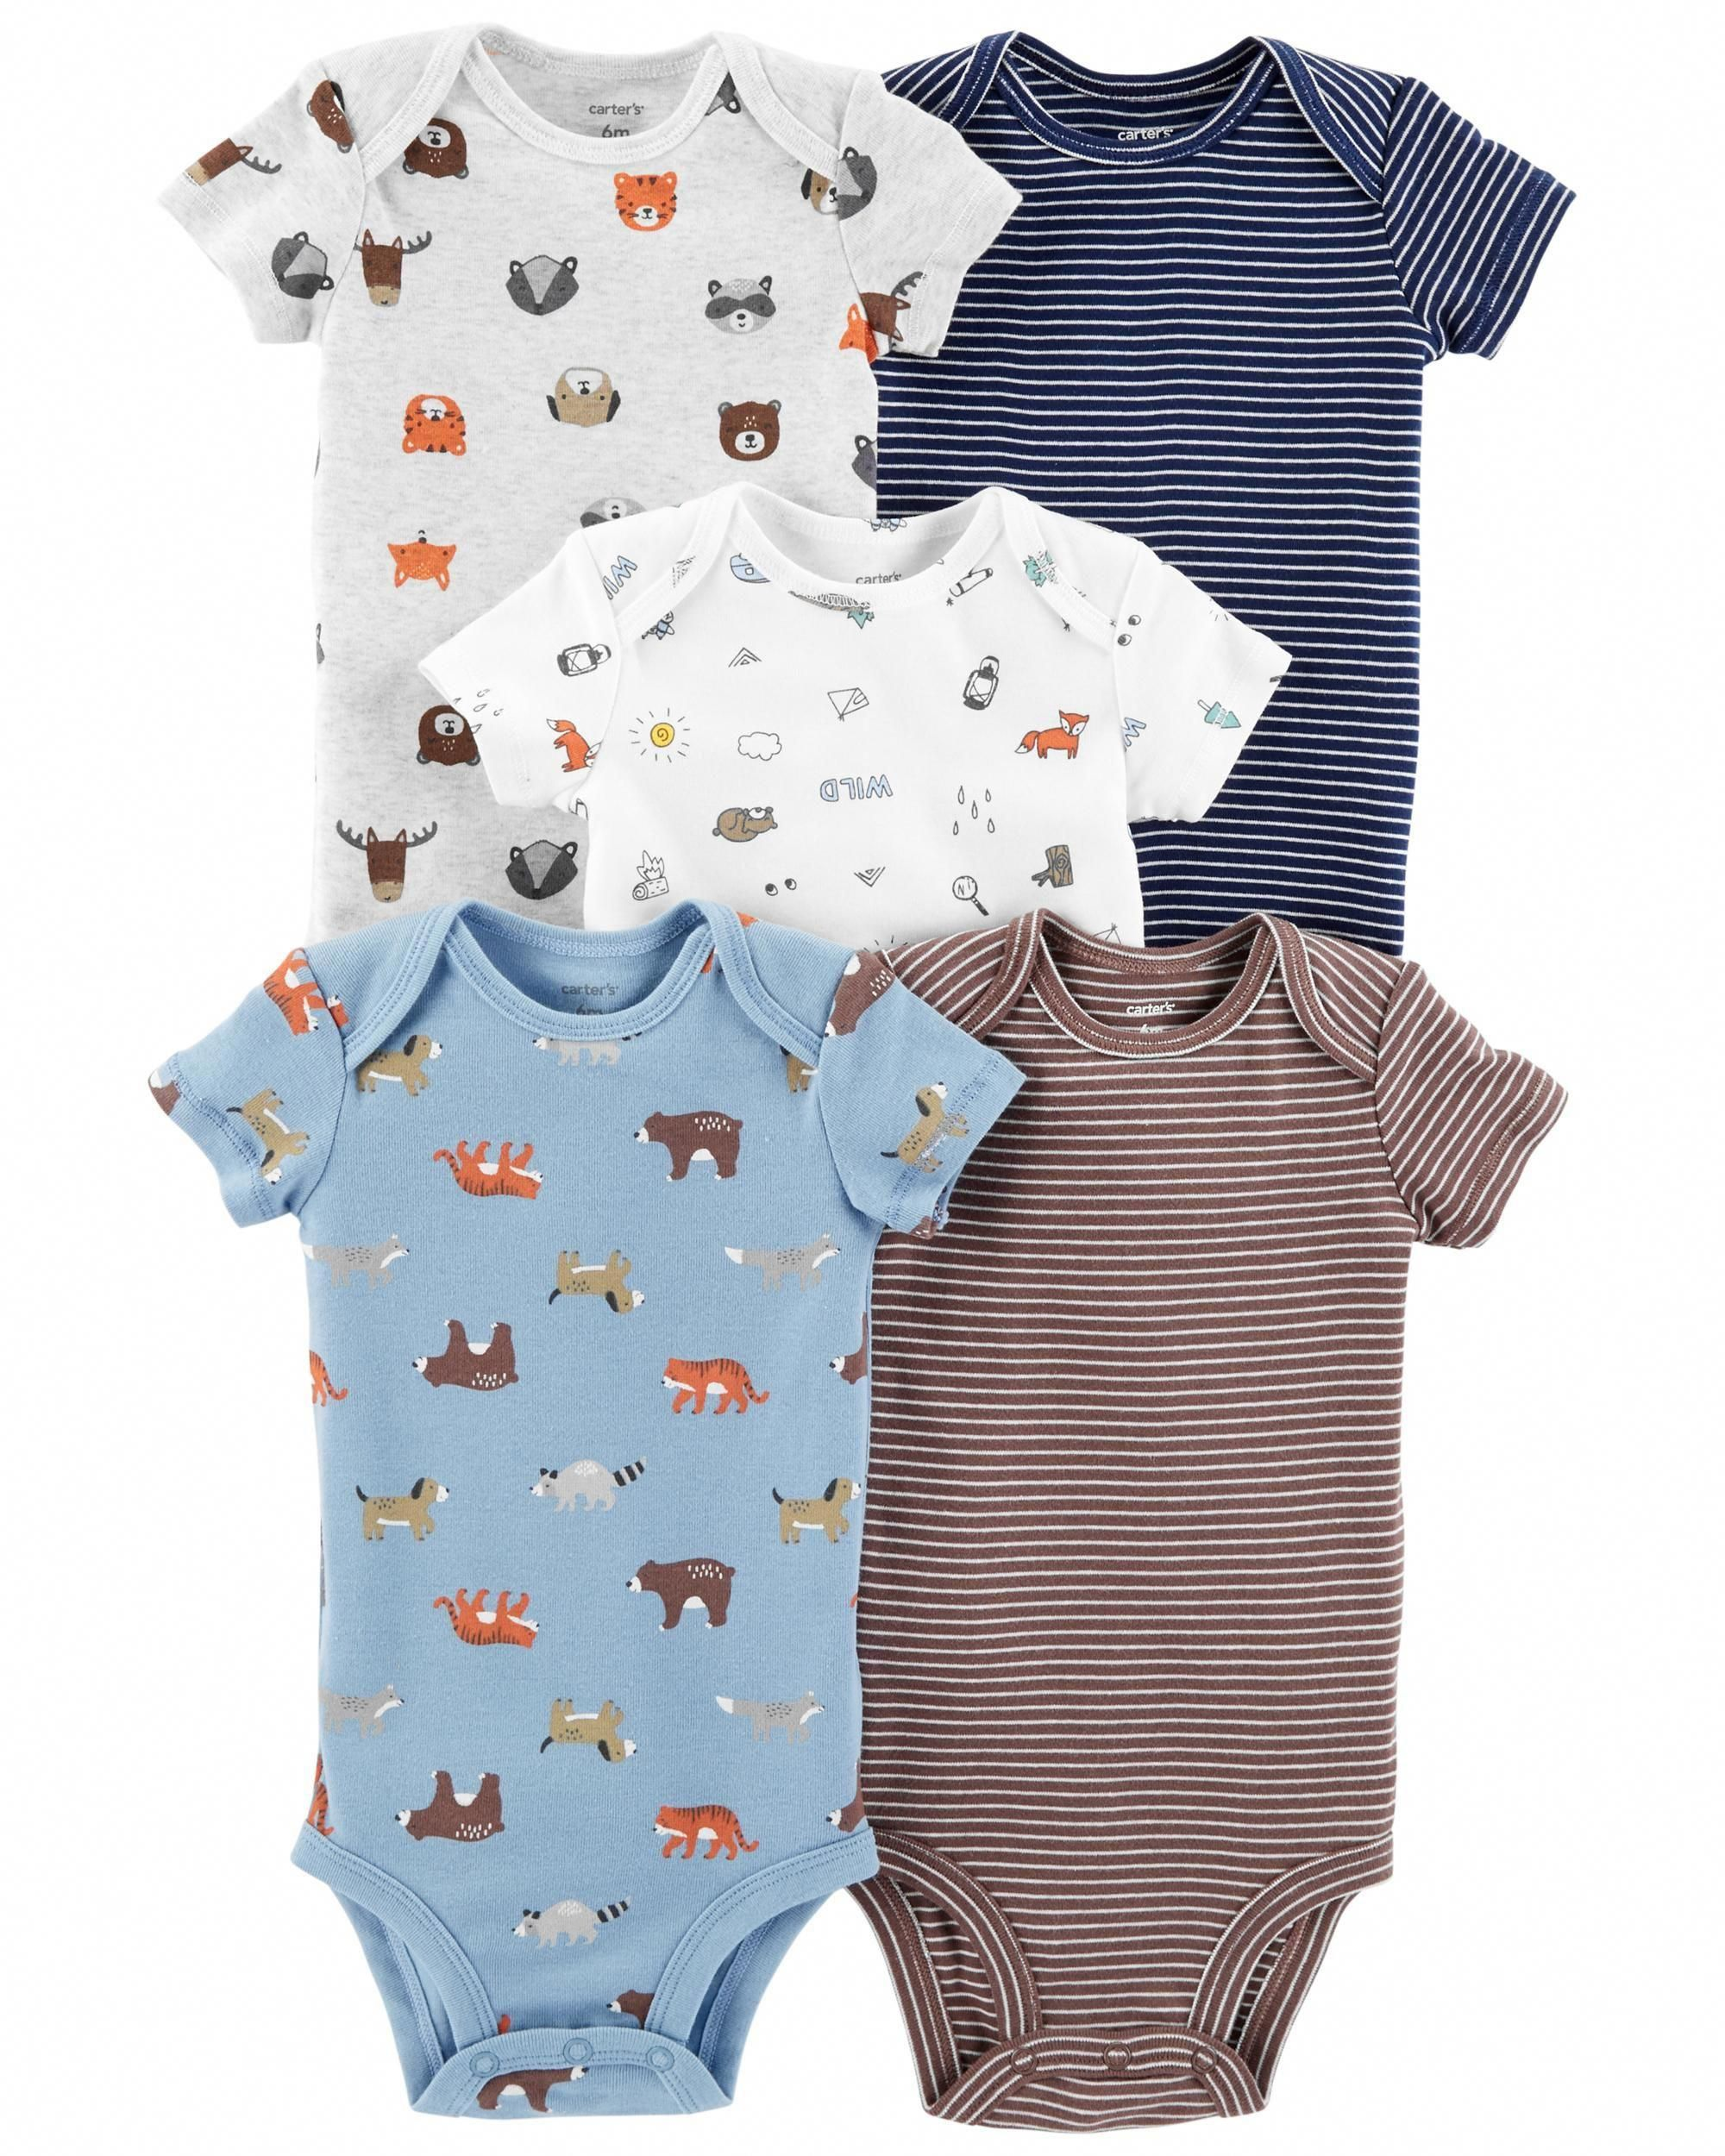 Kids Clothes Clearance  0630a9cbfa27